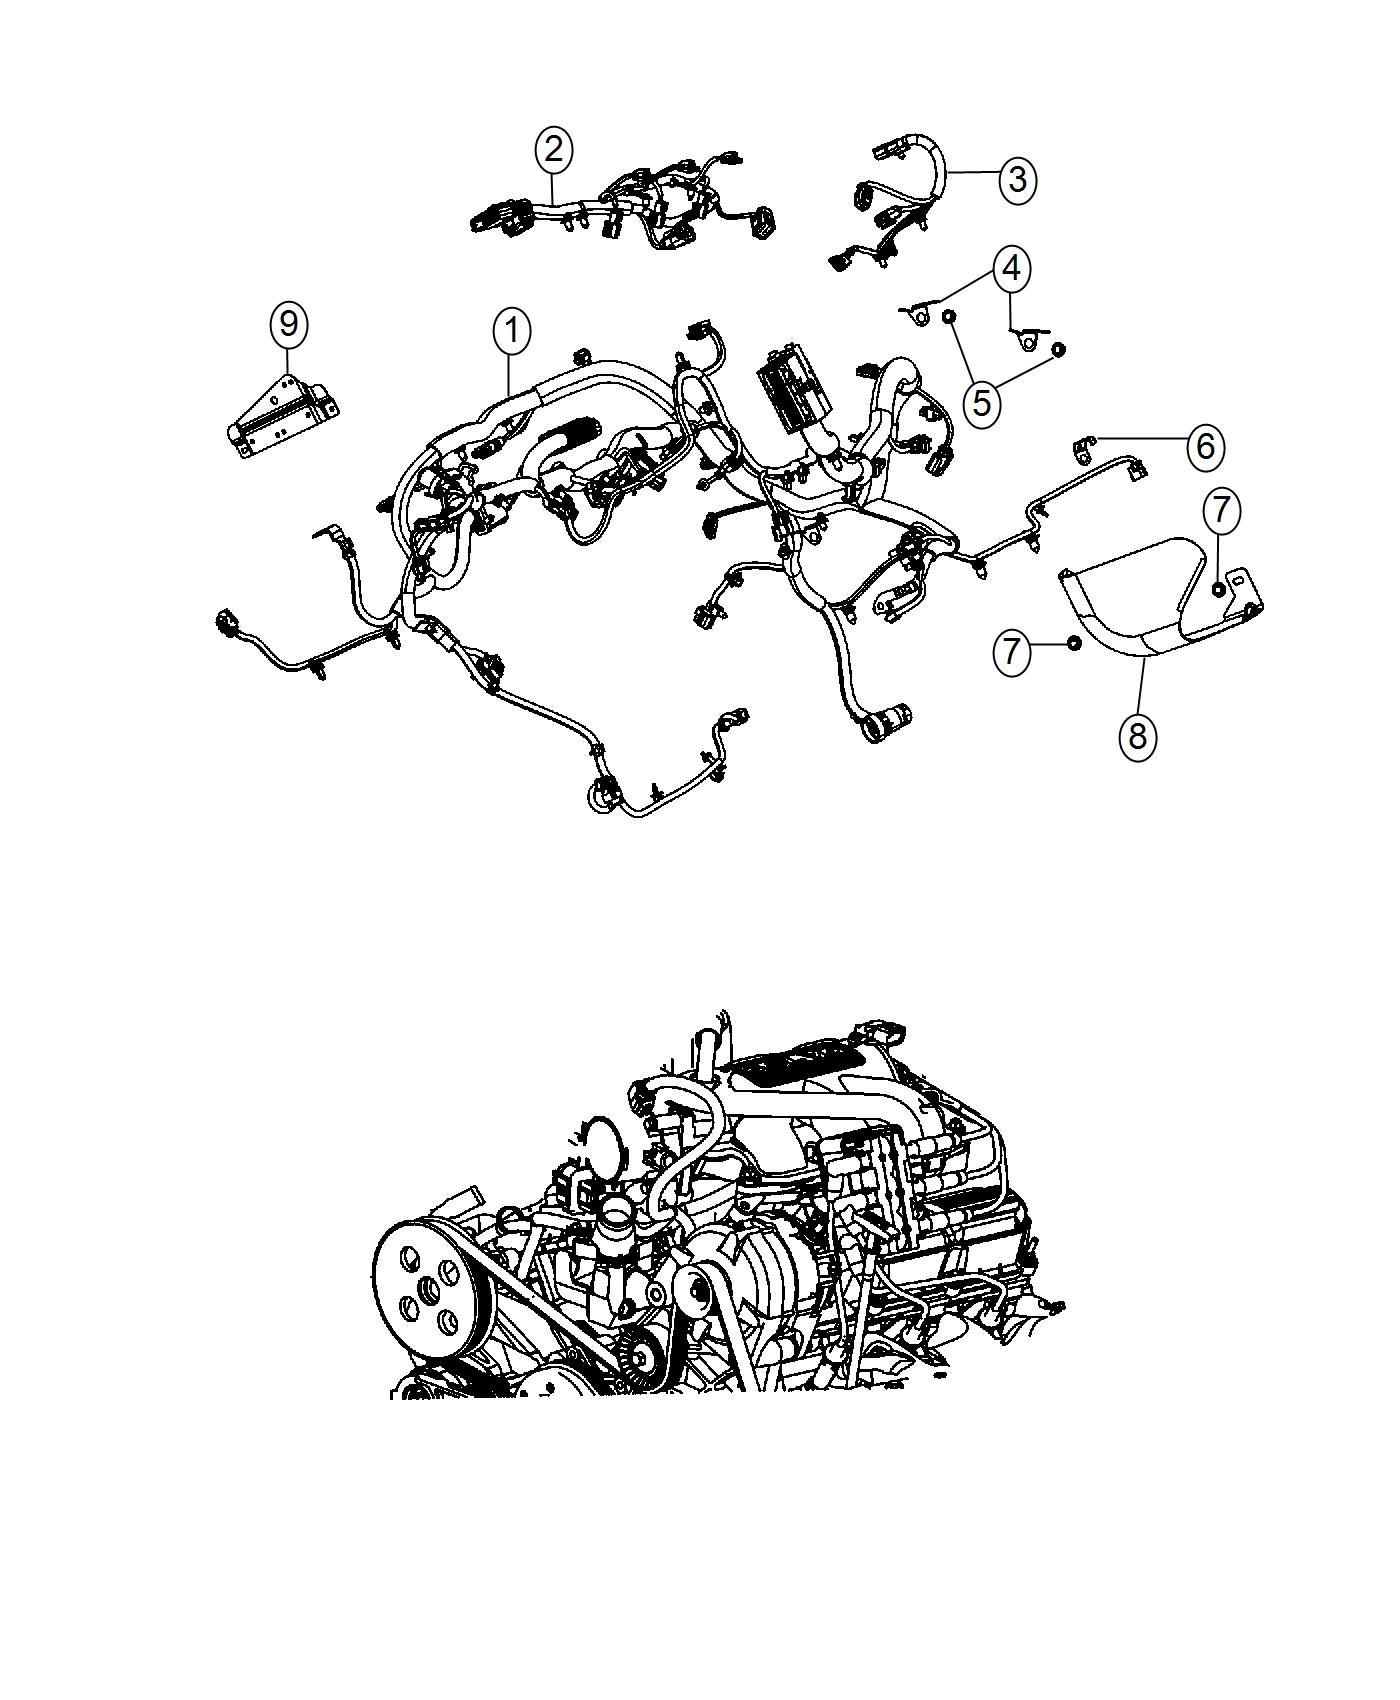 2012 Jeep Wrangler 3 6l Engine Diagram Html